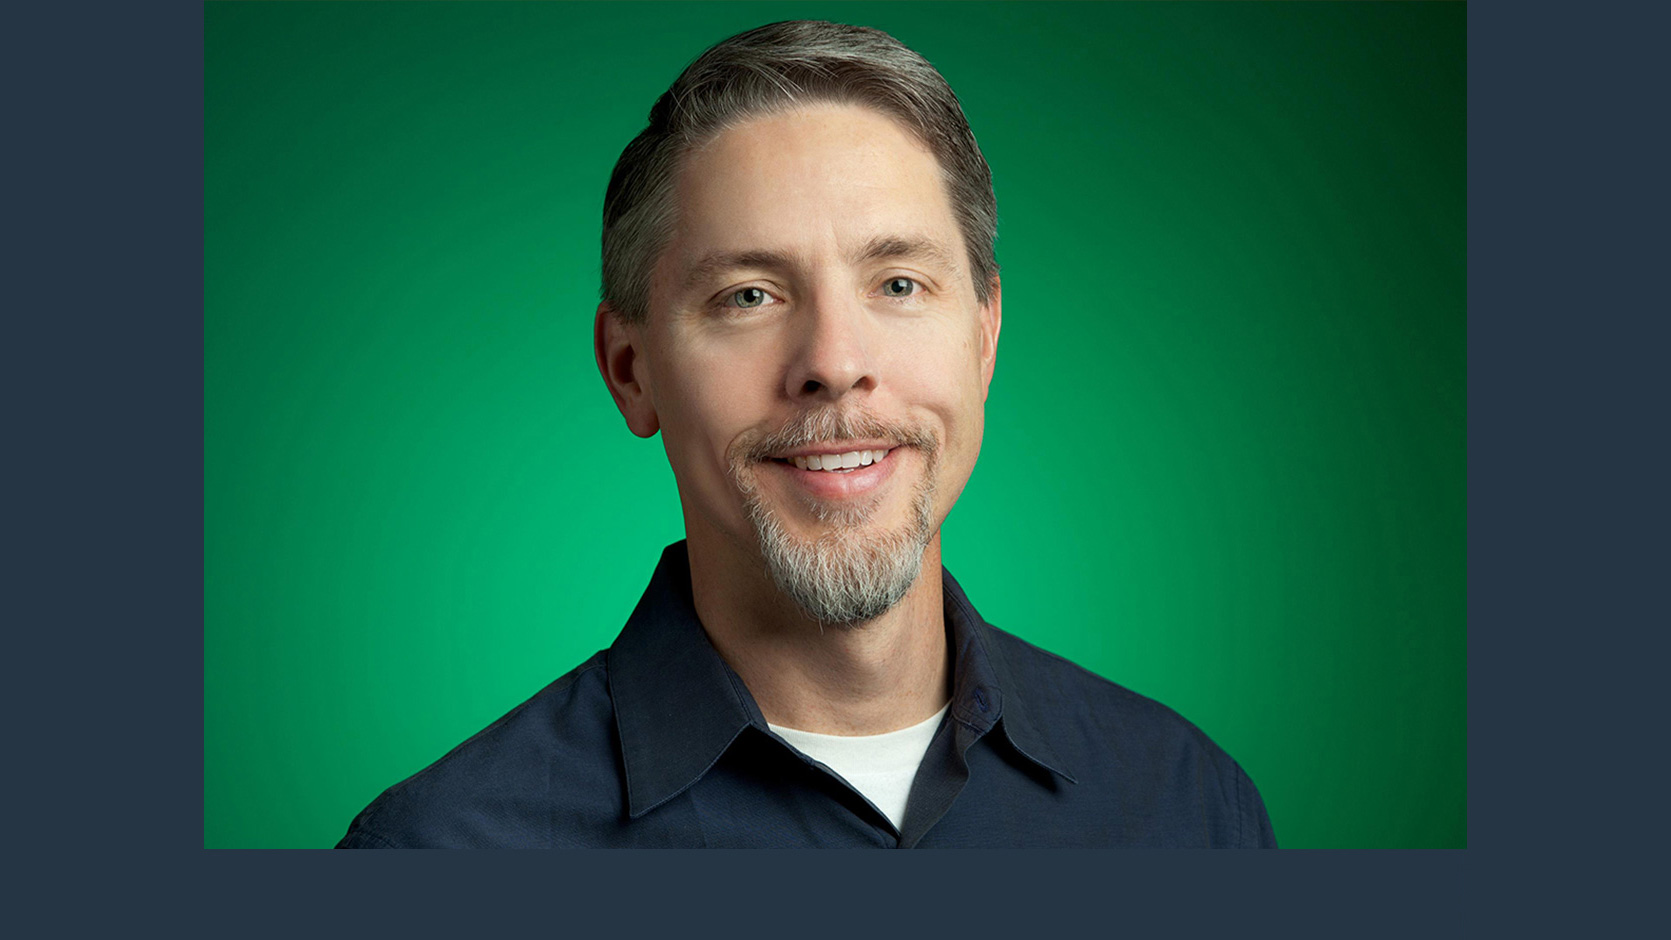 GRAIL CEO Jeff Huber, Illinois alumnus and 2016 Commencement speaker